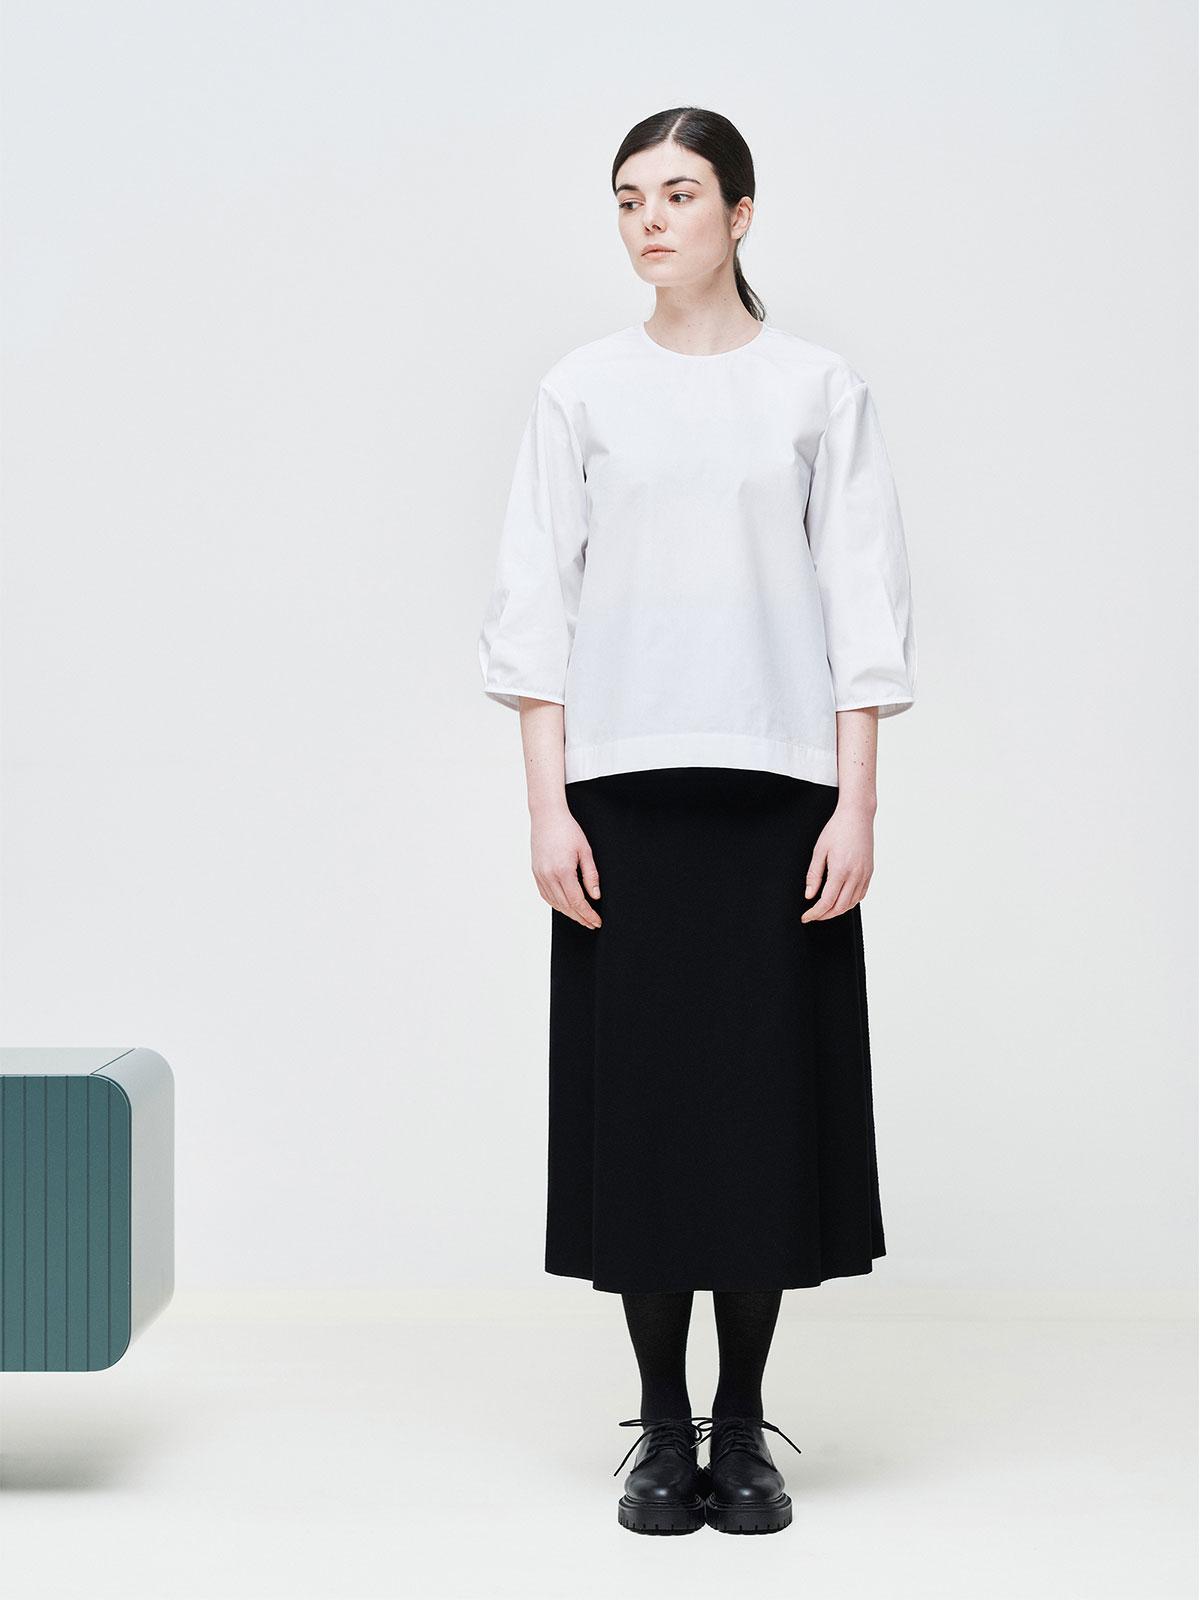 Garderob050910 C